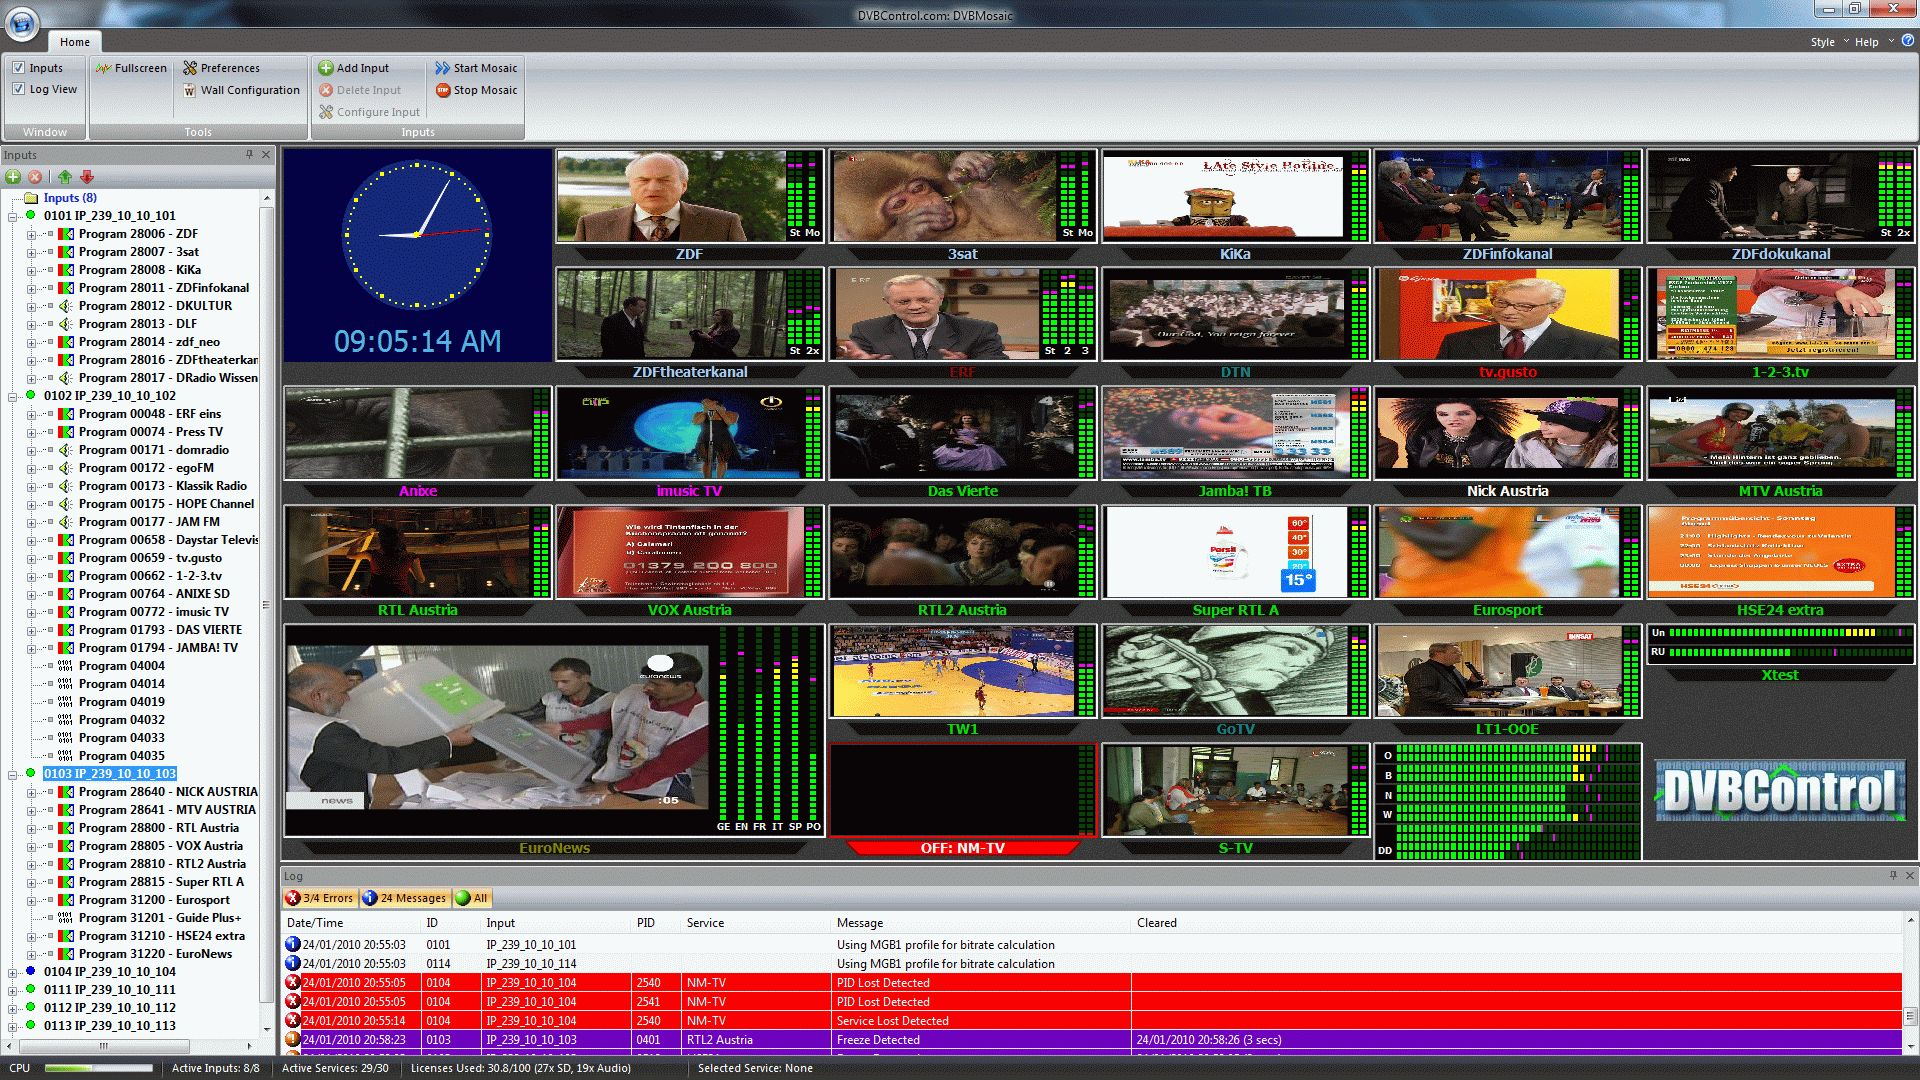 DVBMosaic - DVBControl